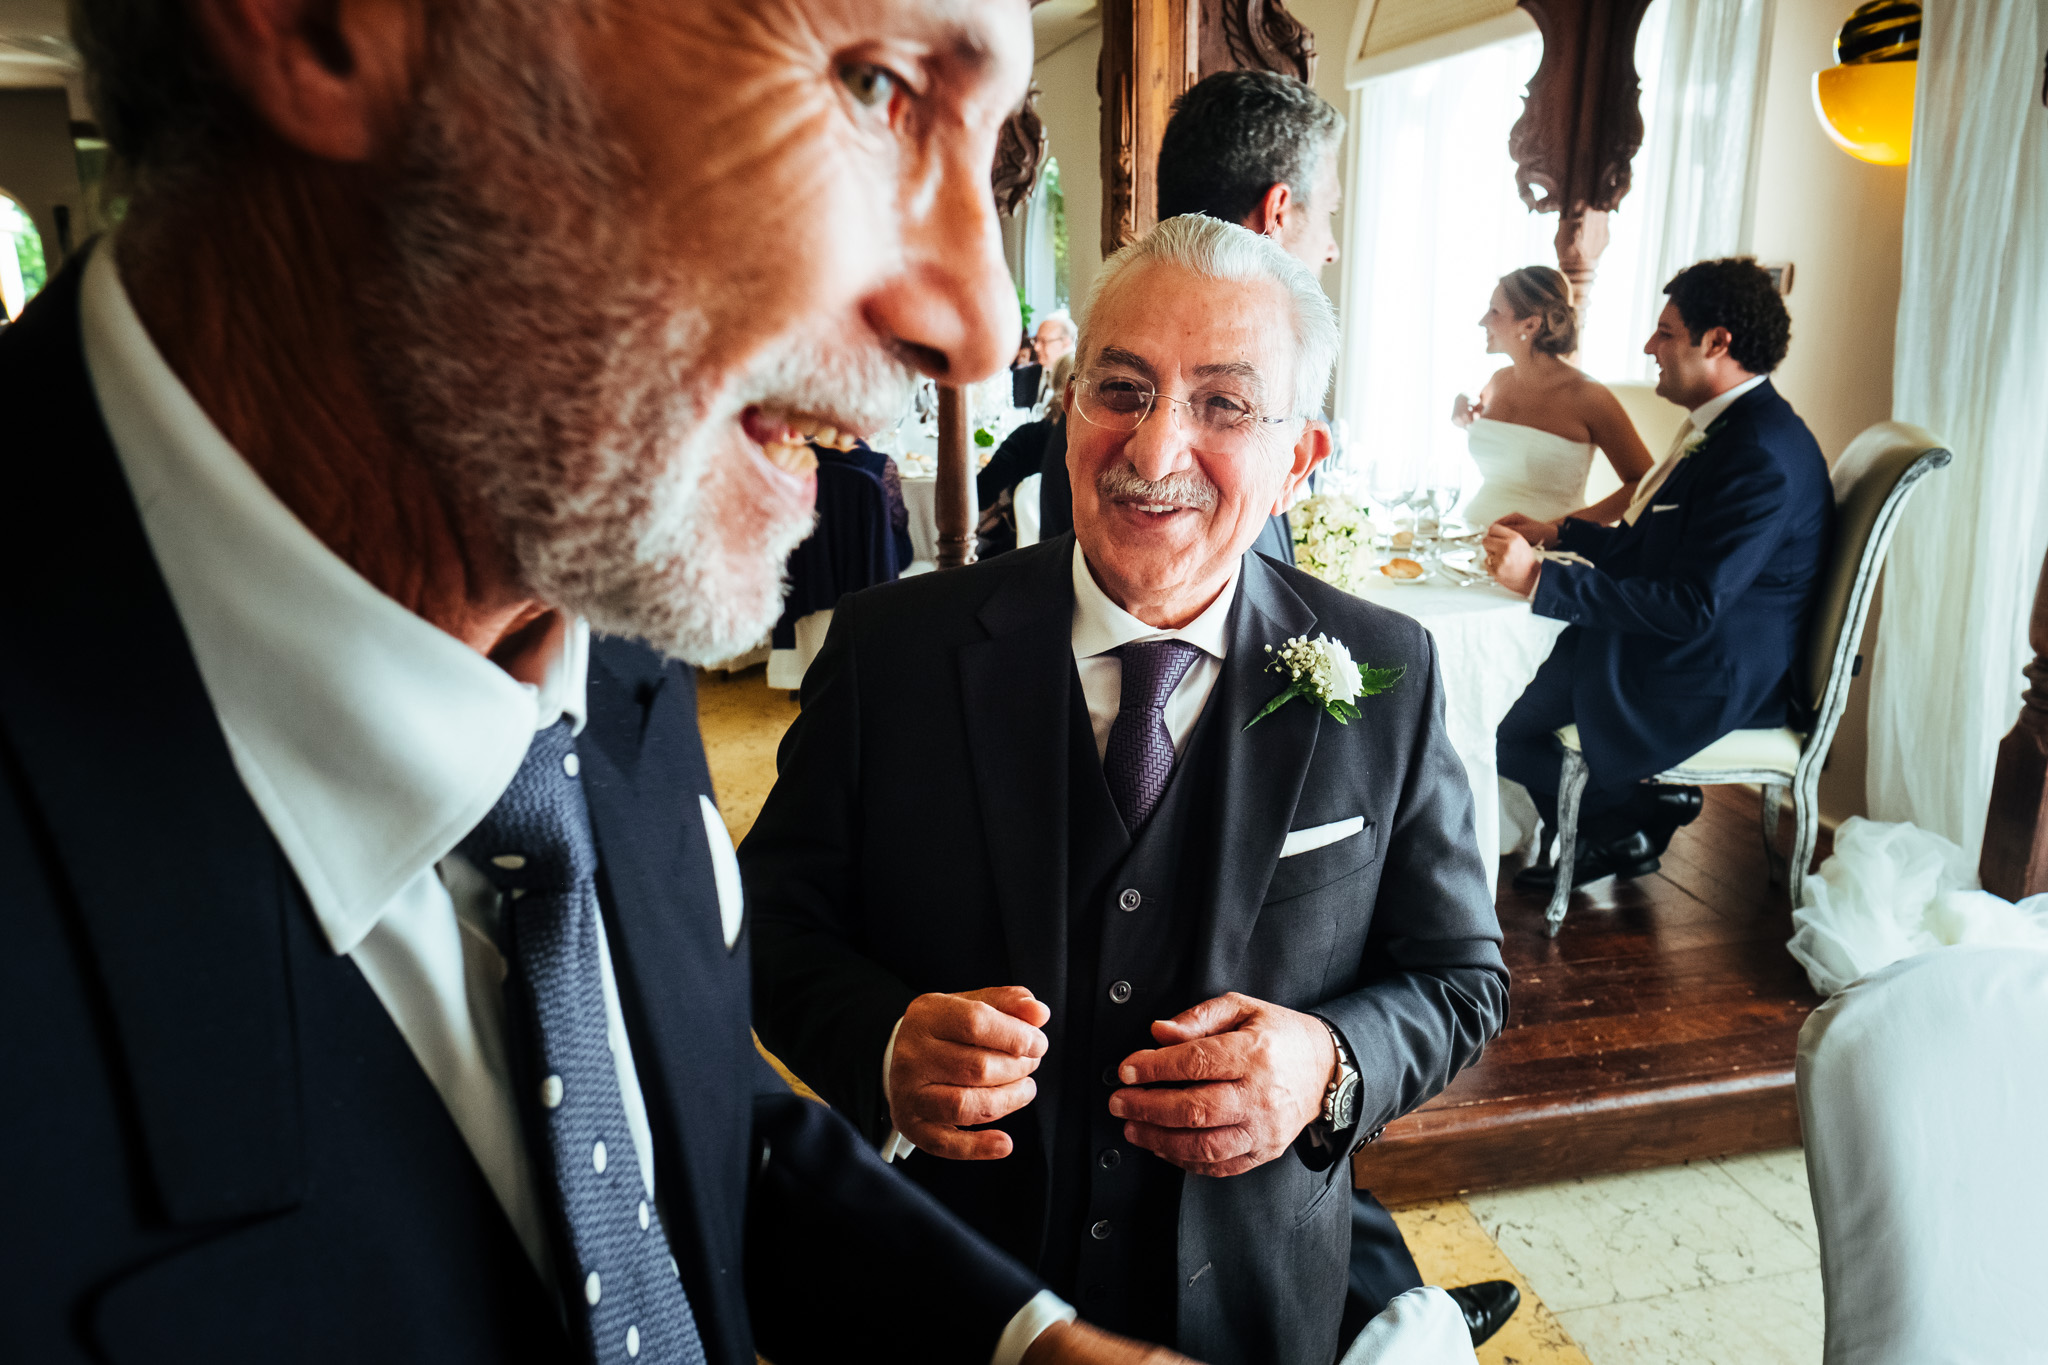 matrimonio-a-catania-63.jpg